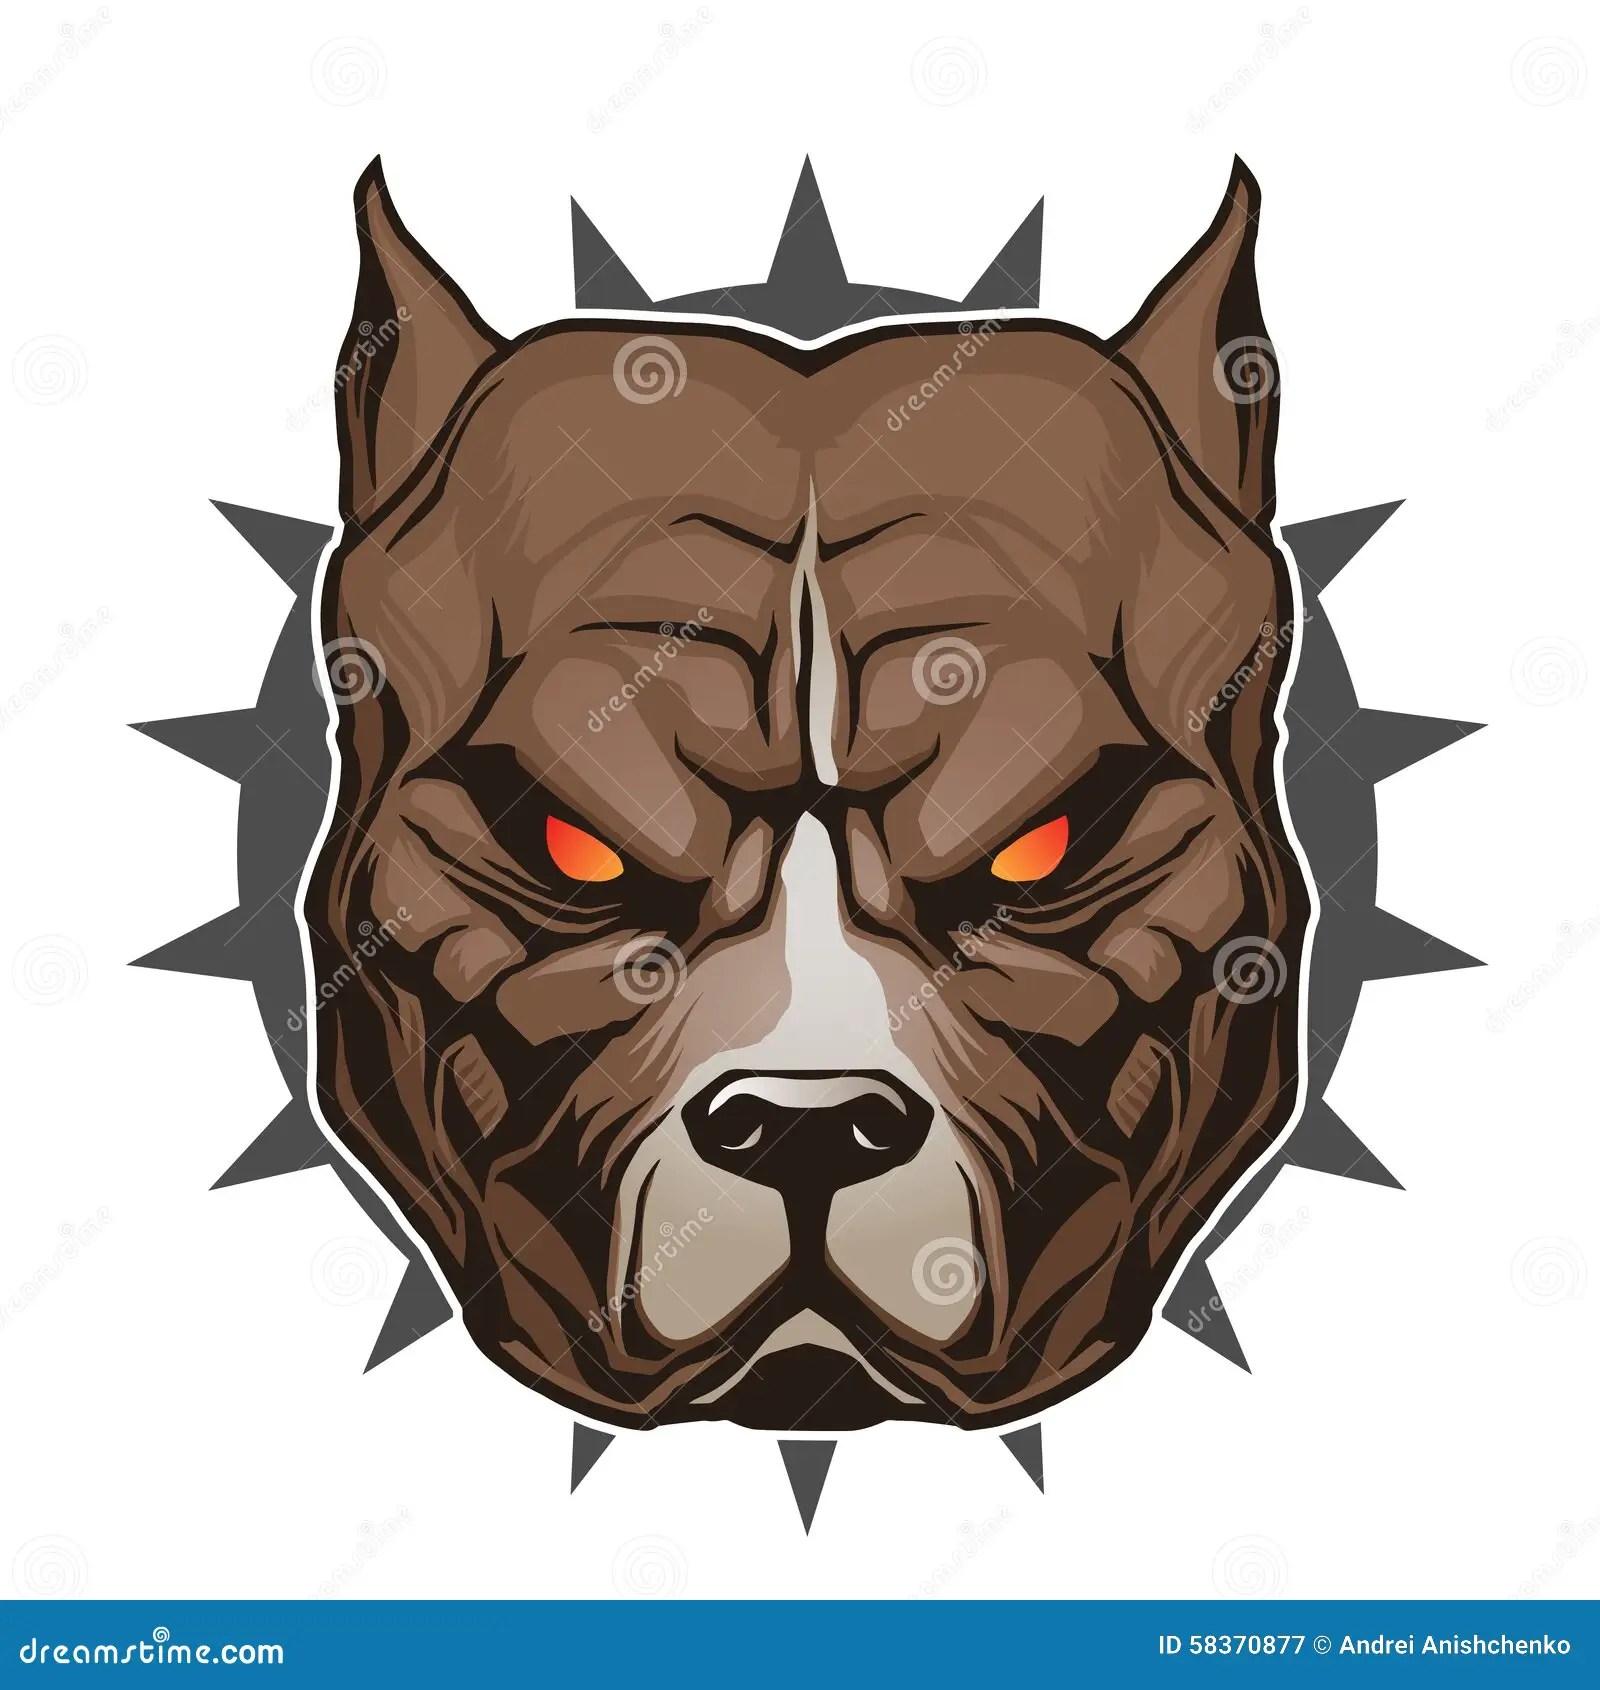 Wallpaper Perritos 3d Pitbull Head Stock Vector Image 58370877